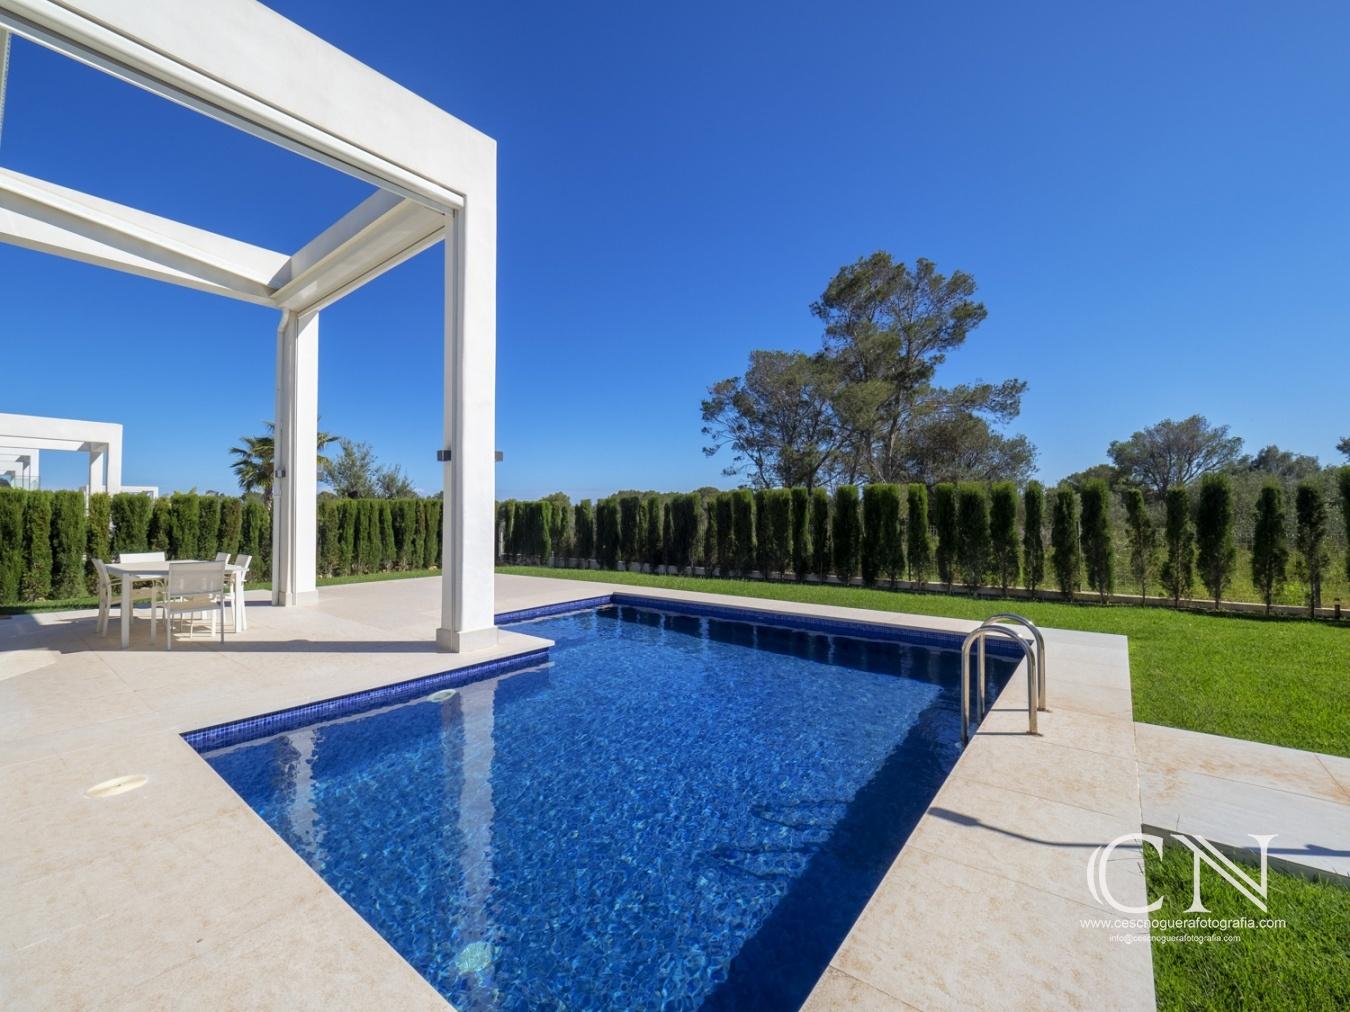 Casa a Cala Murada - Cesc Noguera Fotografia,  Architectural & Interior design photographer / Landscape Photography.